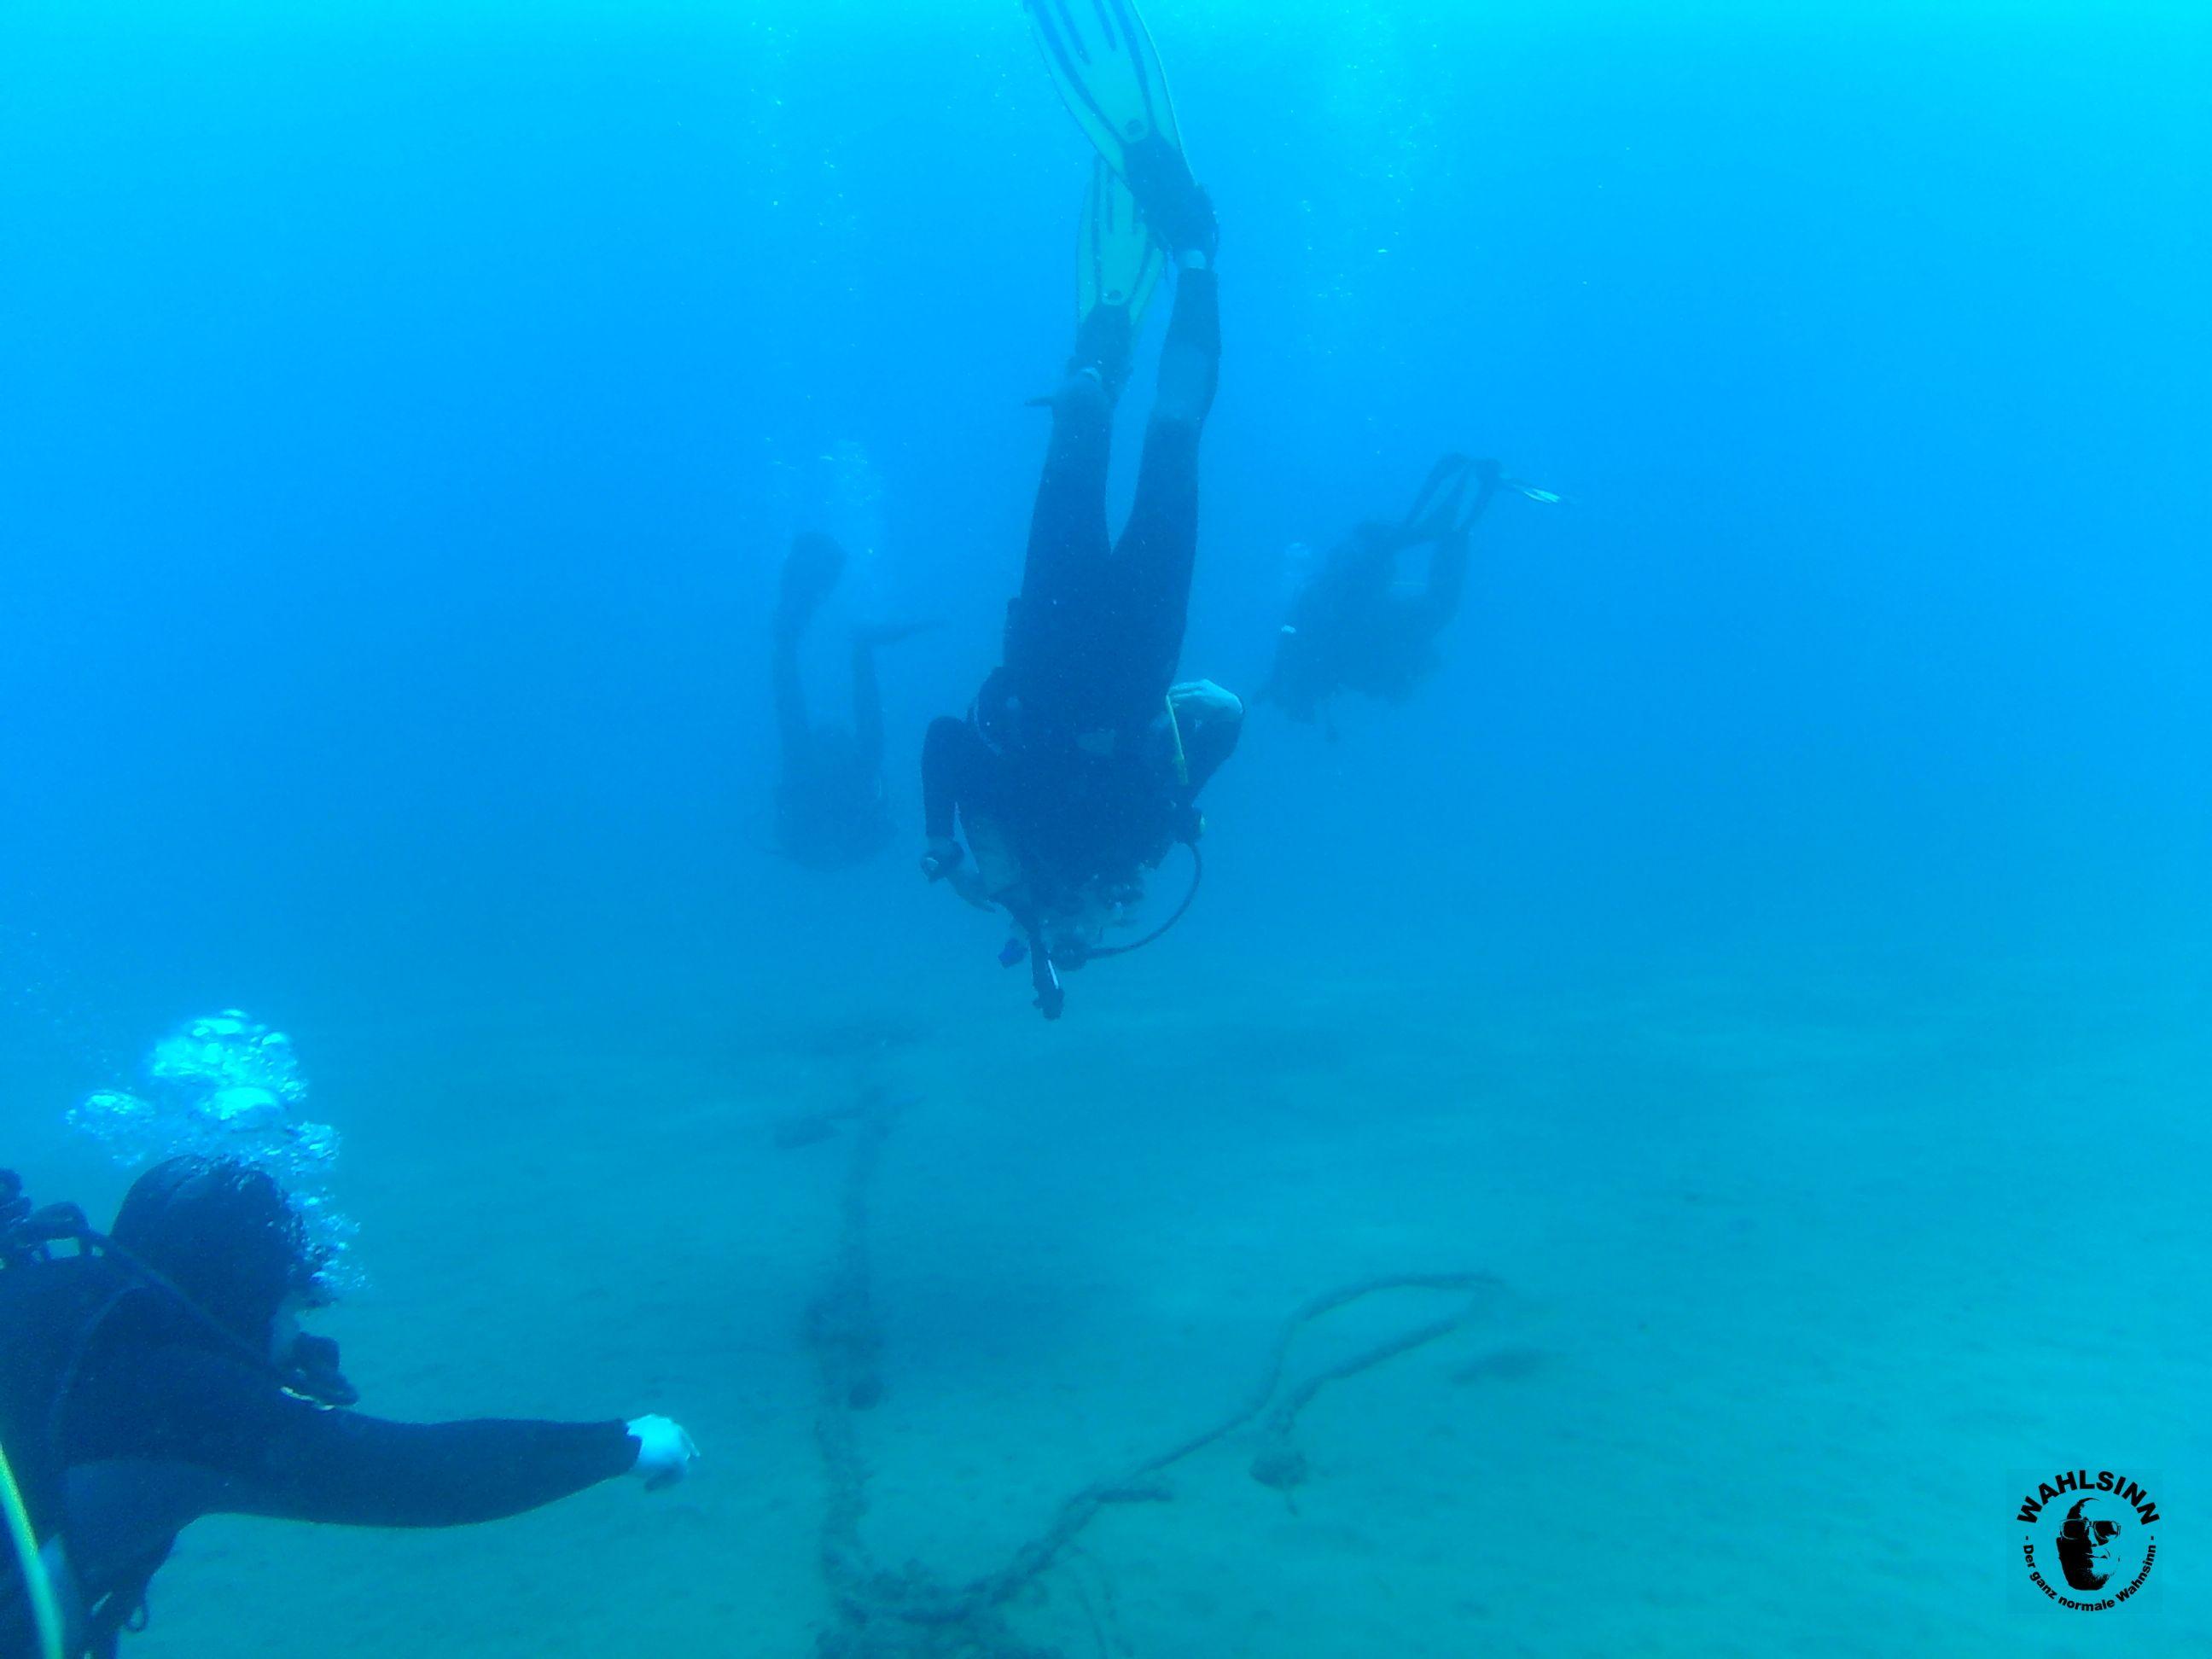 Tauchen Lanzarote - Playa Chica - Einmal Tiefgeschoss bitte